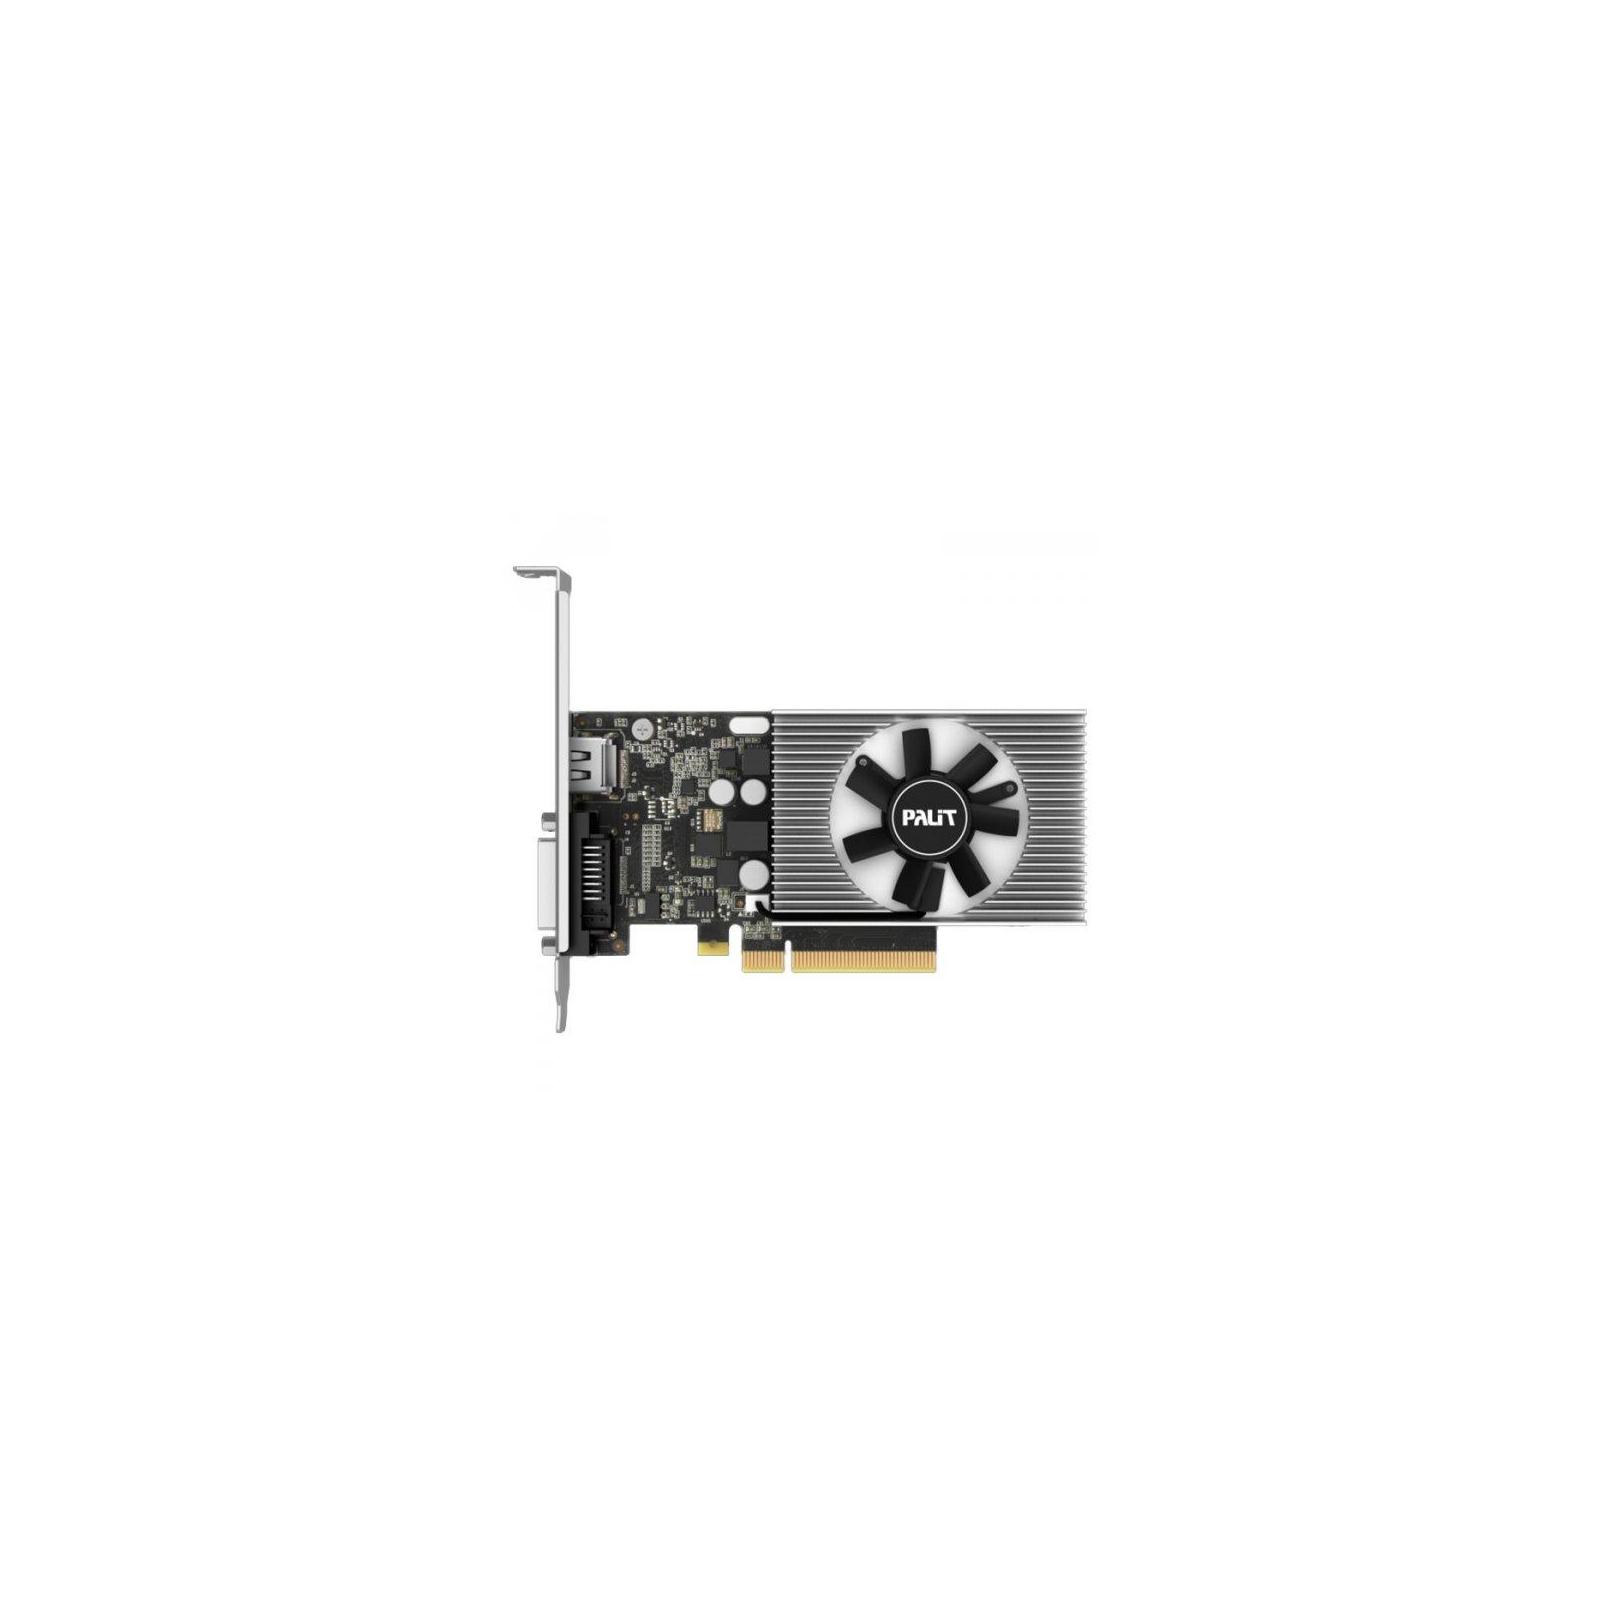 Видеокарта GeForce GT1030 2048Mb PALIT (NEC103000646-1082F) изображение 2